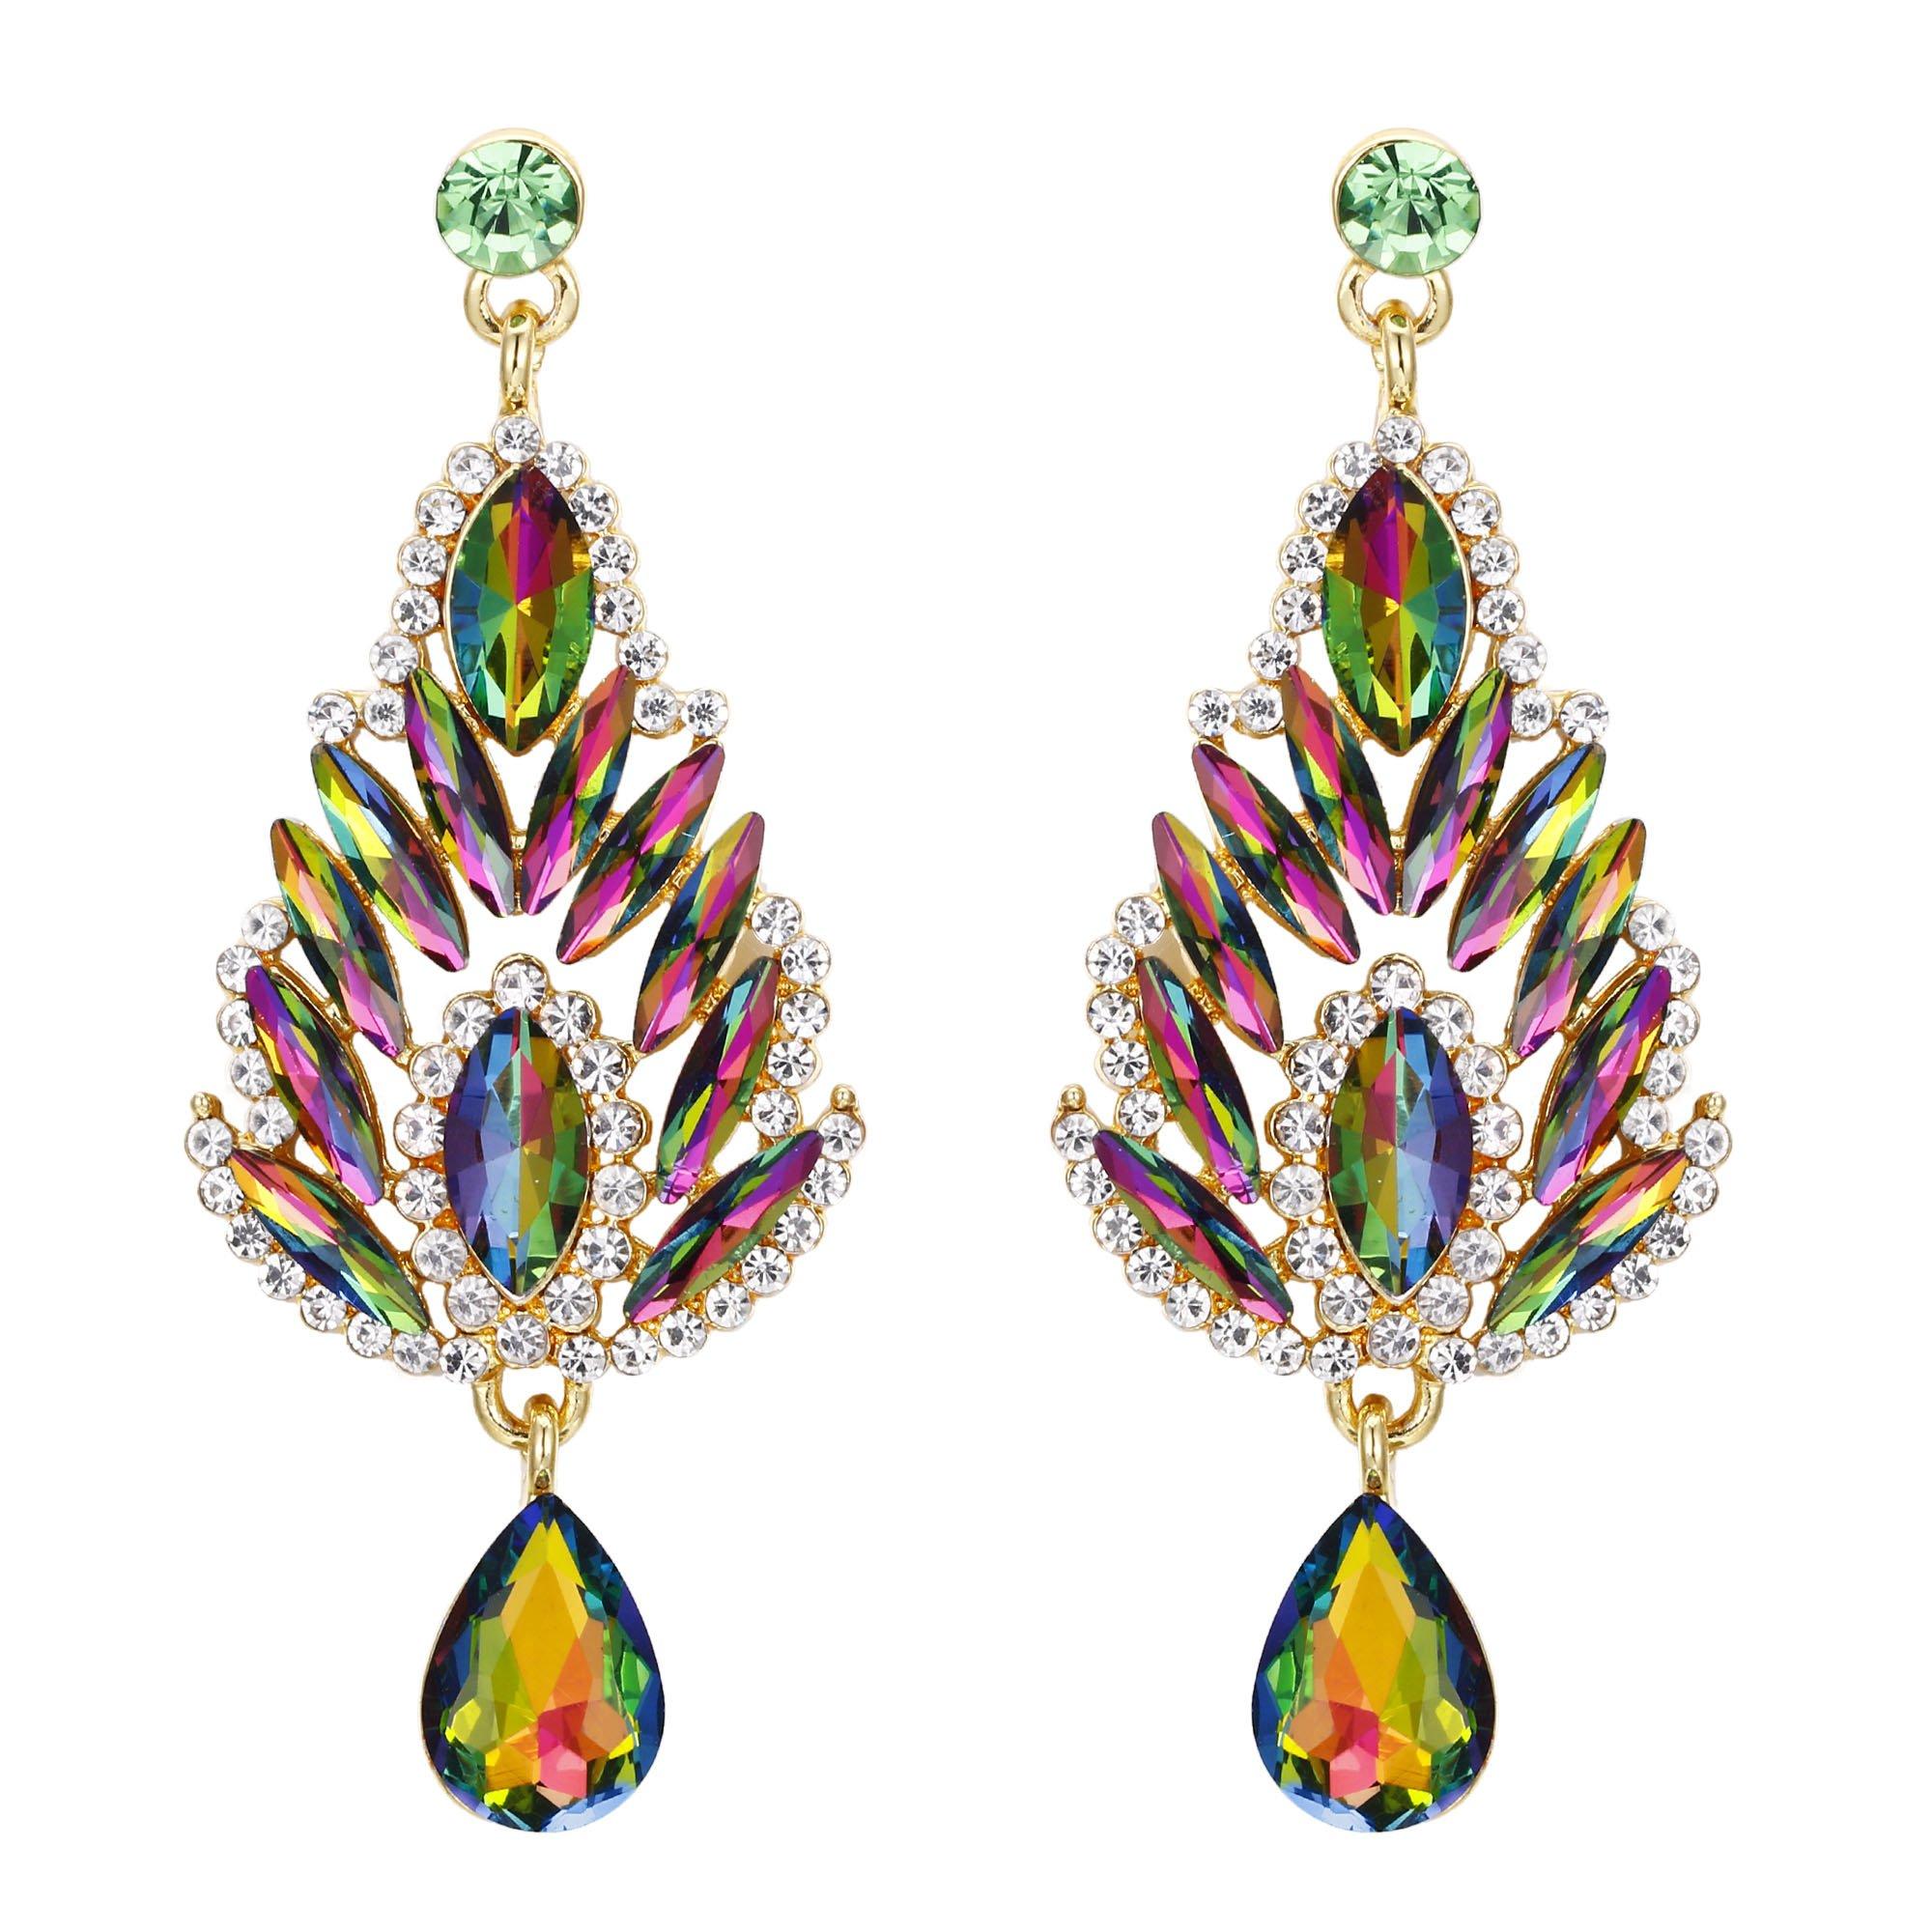 BriLove Women's Bohemian Boho Crystal Bollywood Style Peacock Chandelier Teardrop Dangle Earrings Vitrail Medium Gold-Tone